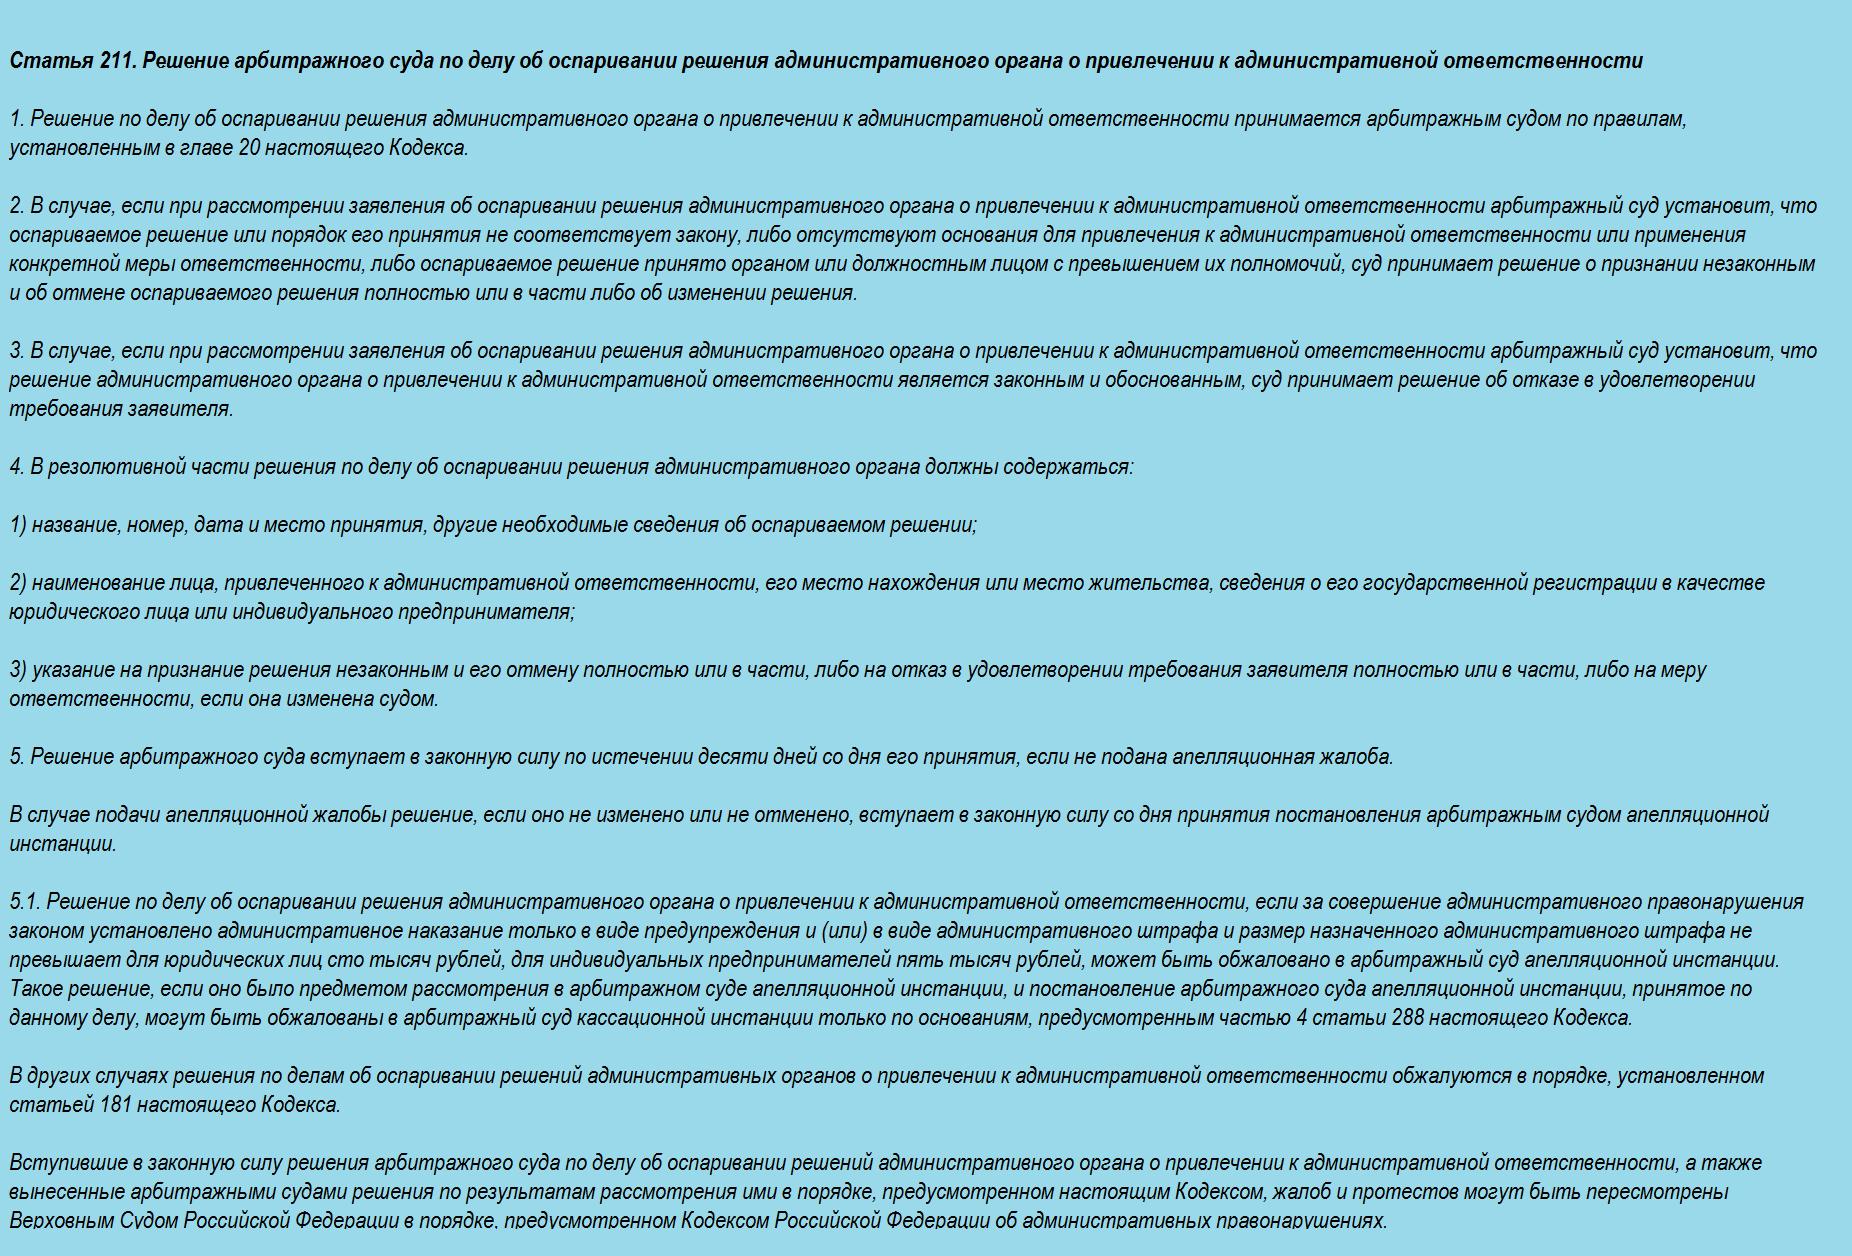 Статья 211 АПК РФ